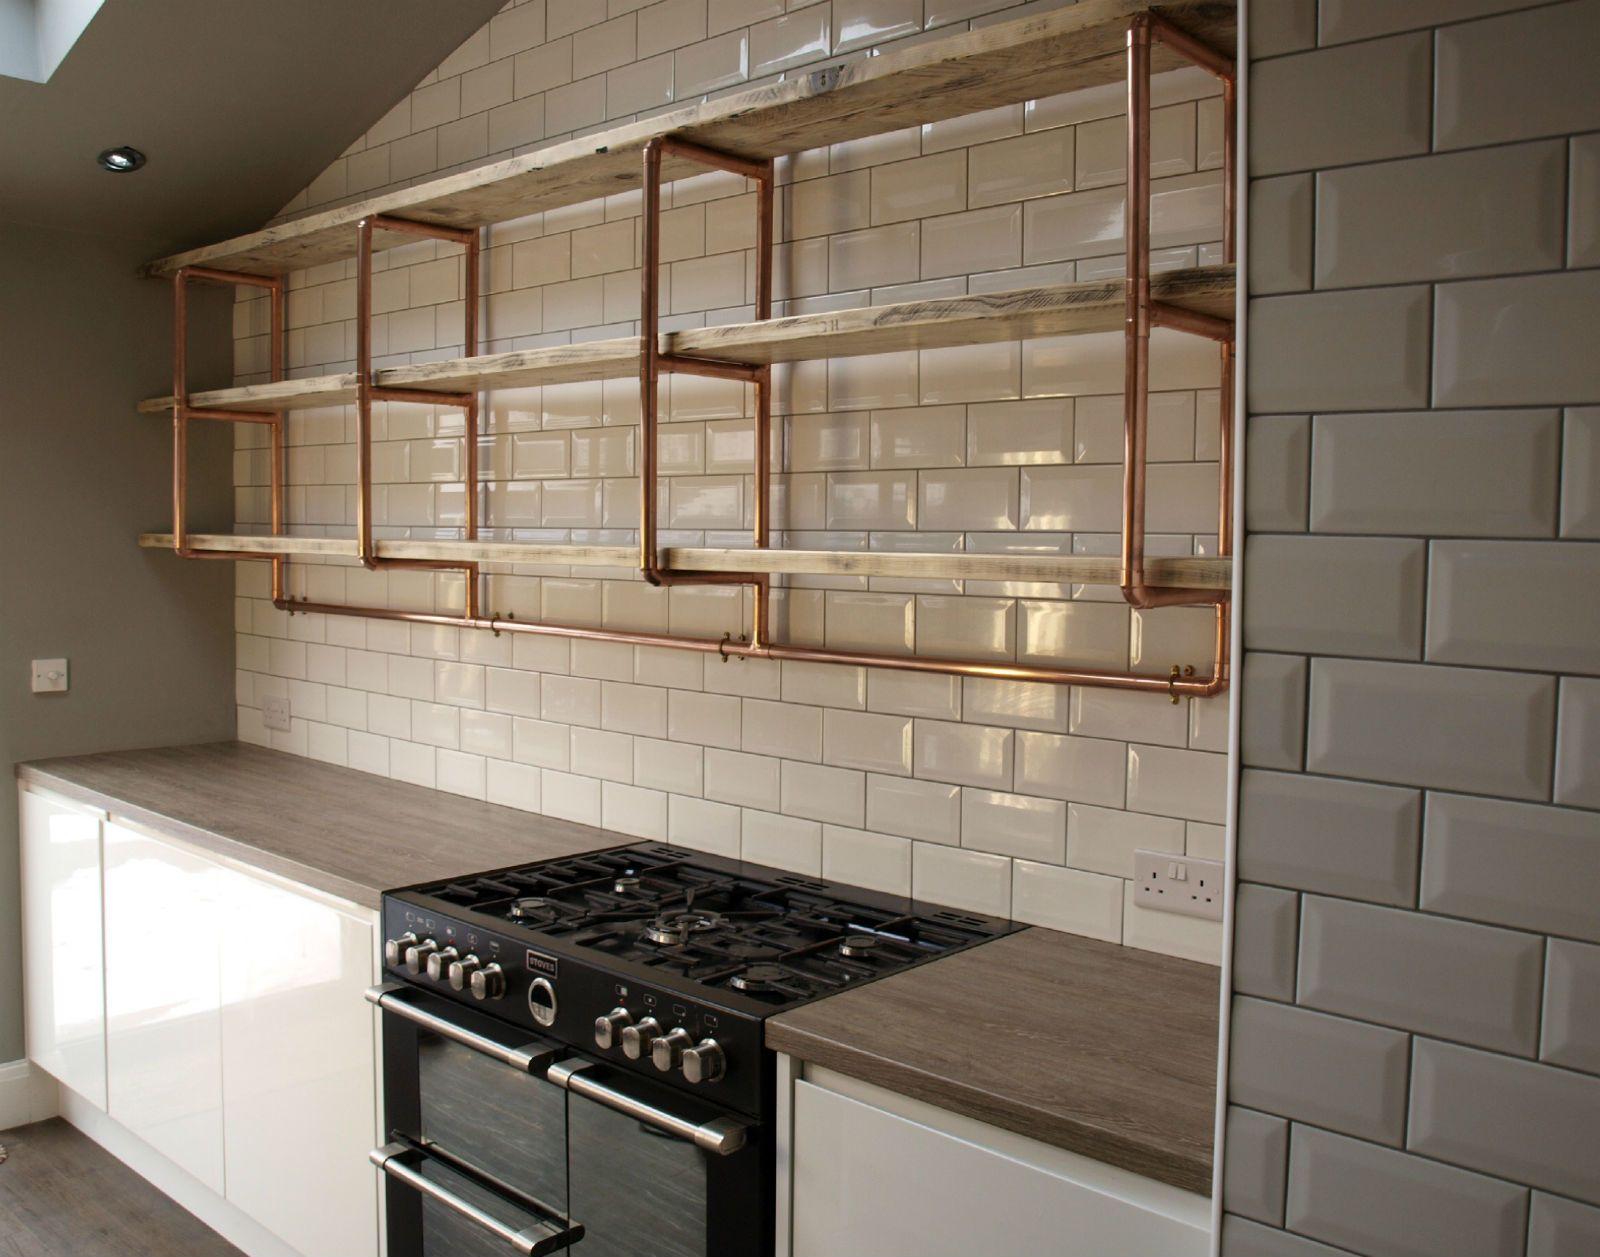 copper-pipes-2 80+ Unusual Kitchen Design Ideas for Small Spaces in 2021